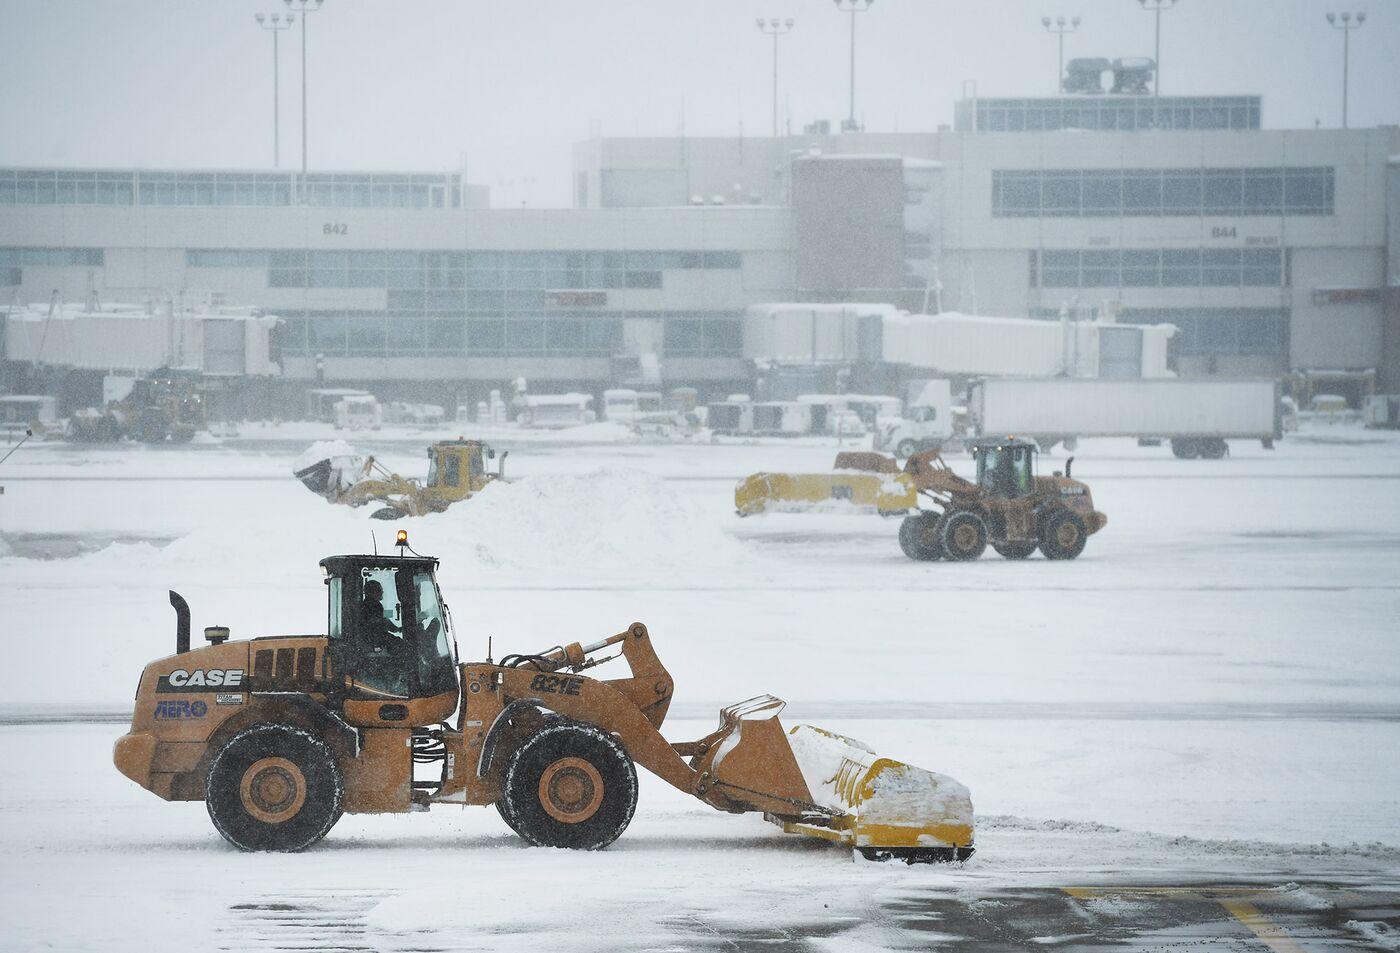 Denver International Airport Snow